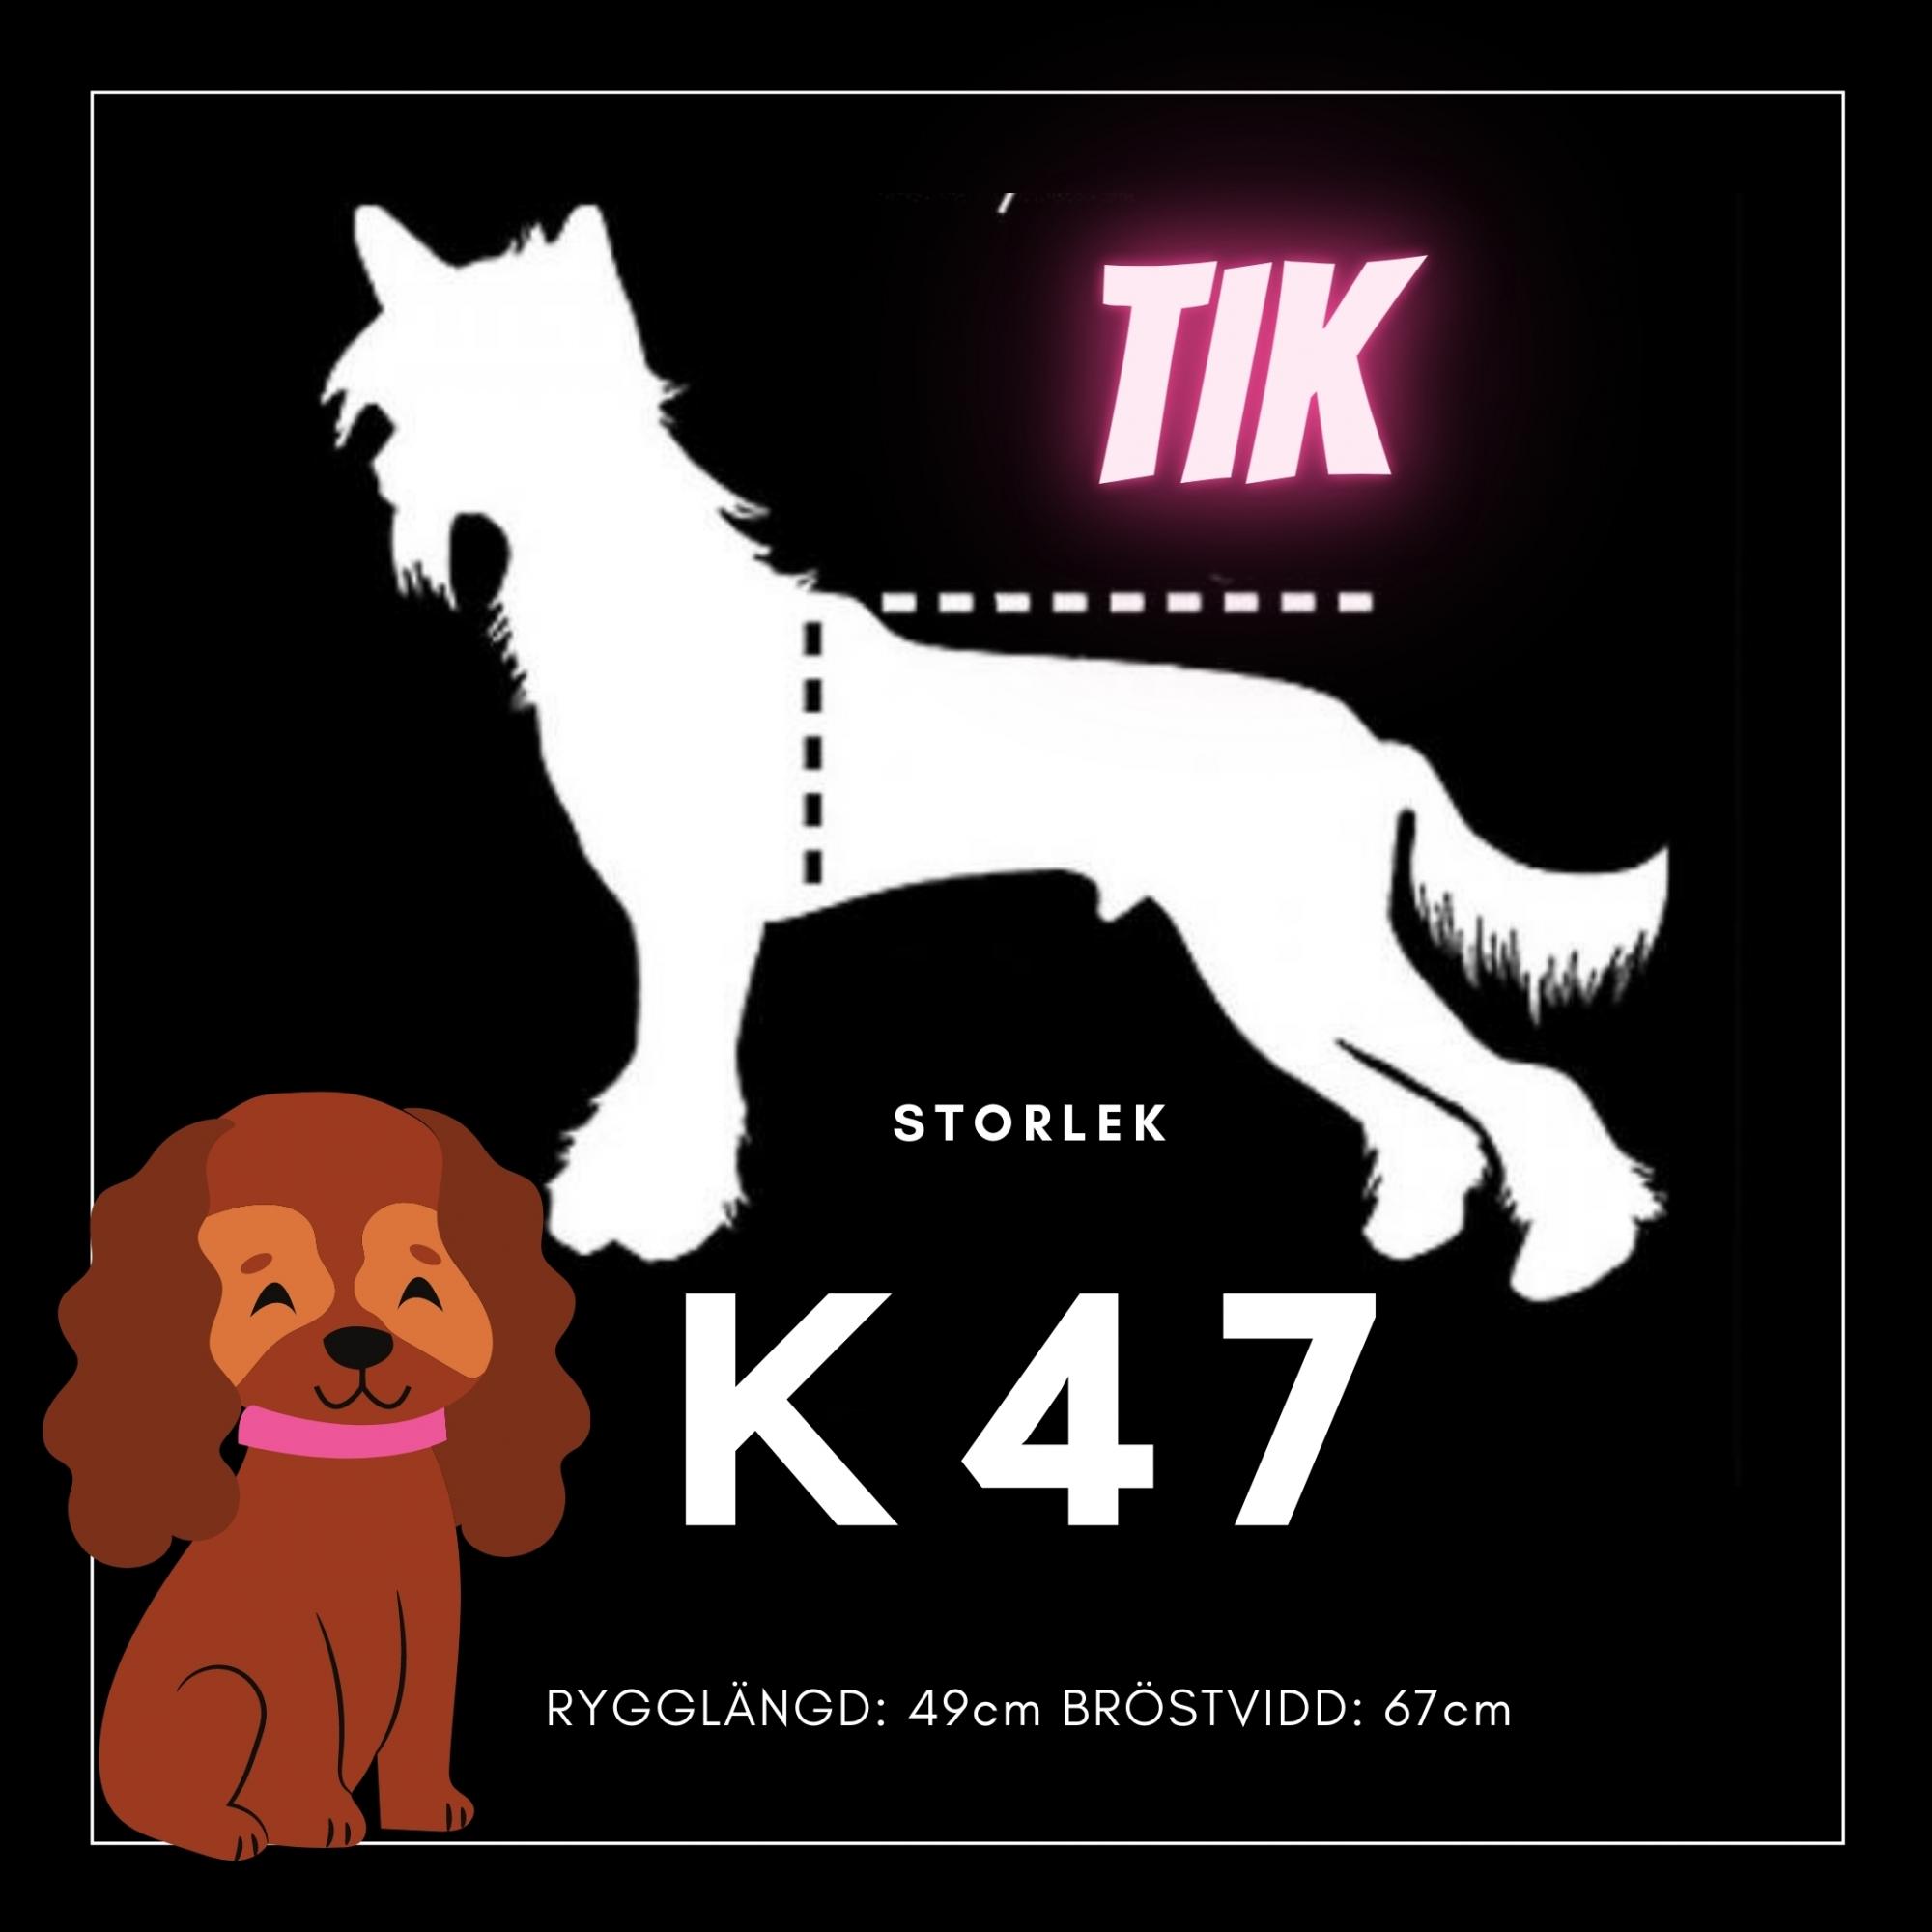 Tik Storlek K47 - Passion For Pet Fashion